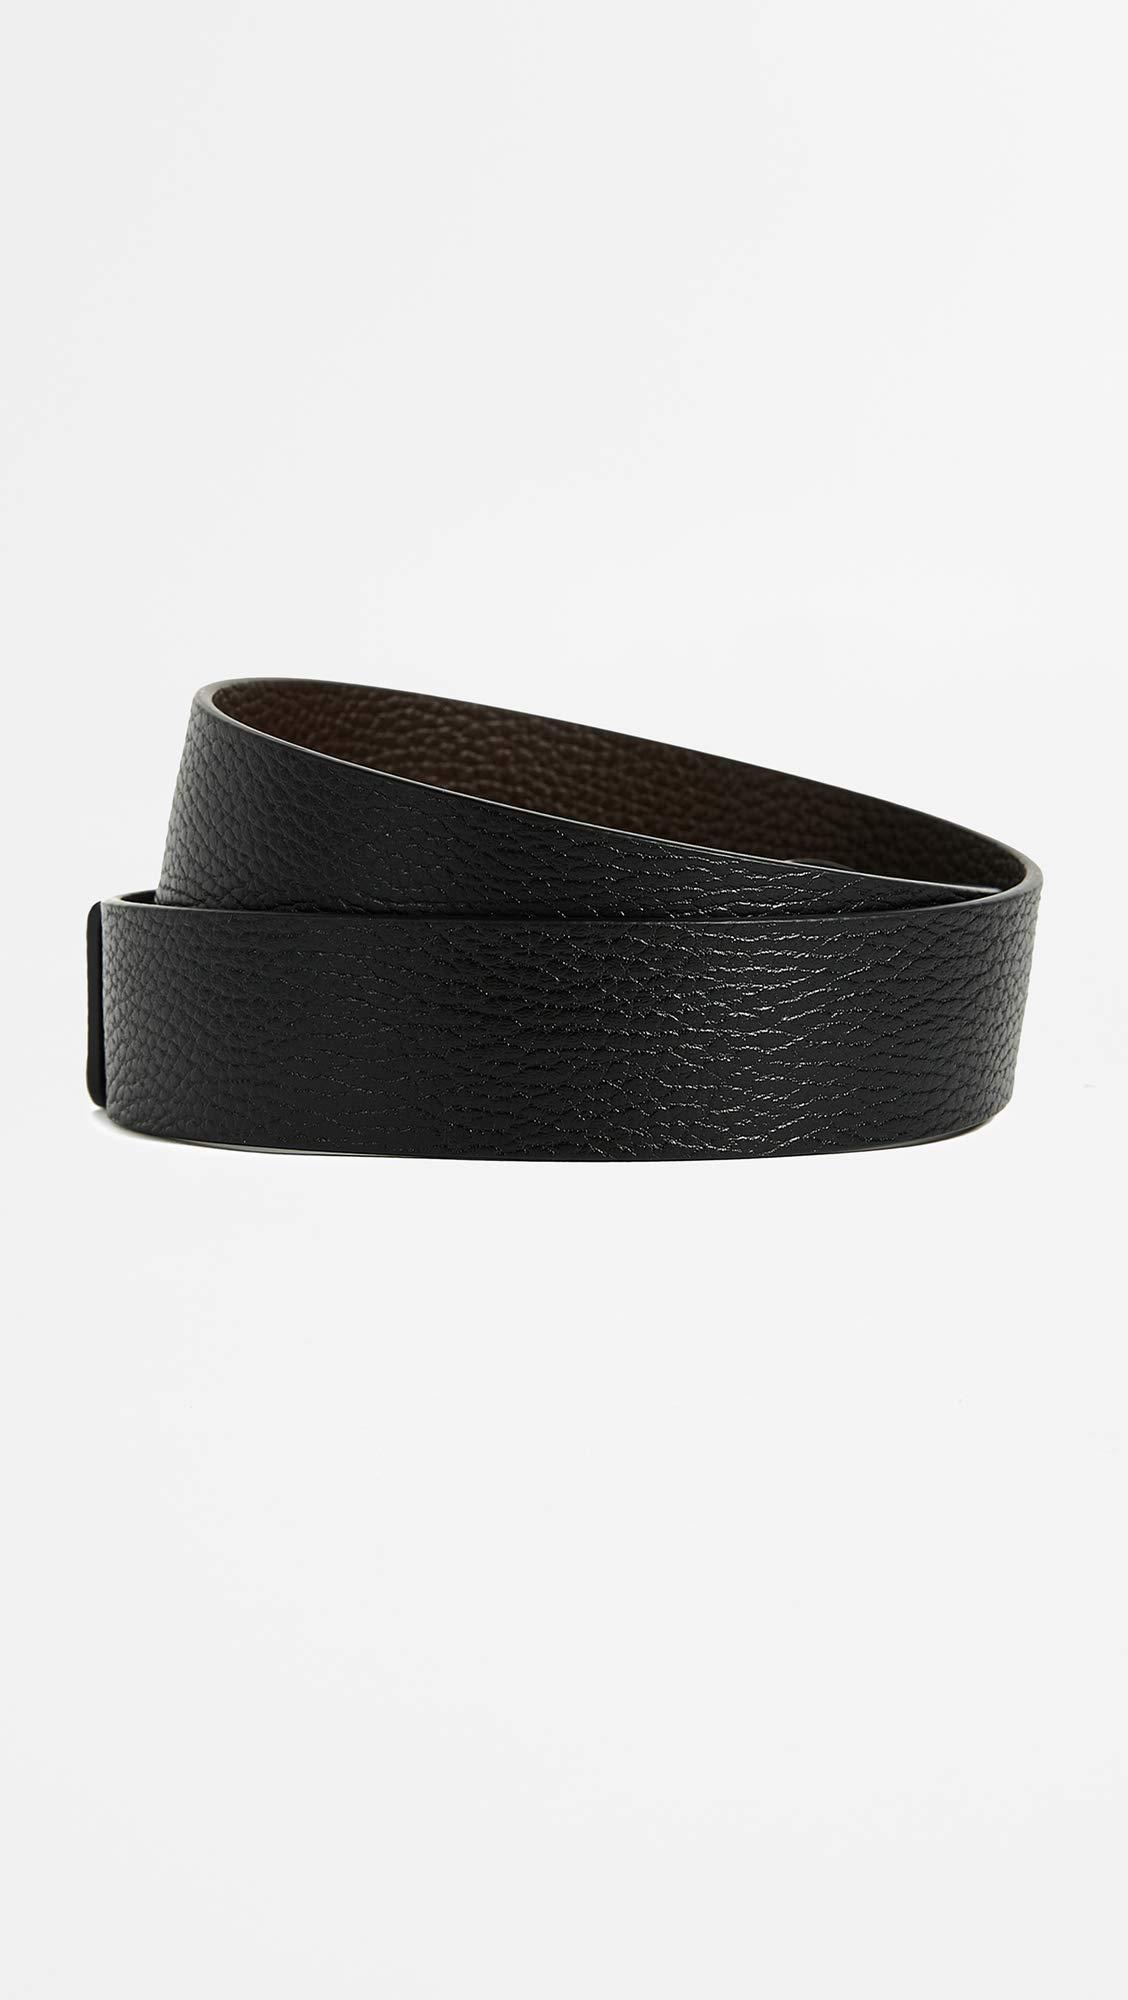 Salvatore Ferragamo Men's Reversible/Adjustable Belt-678783, Nero/Hickory 36 by Salvatore Ferragamo (Image #5)